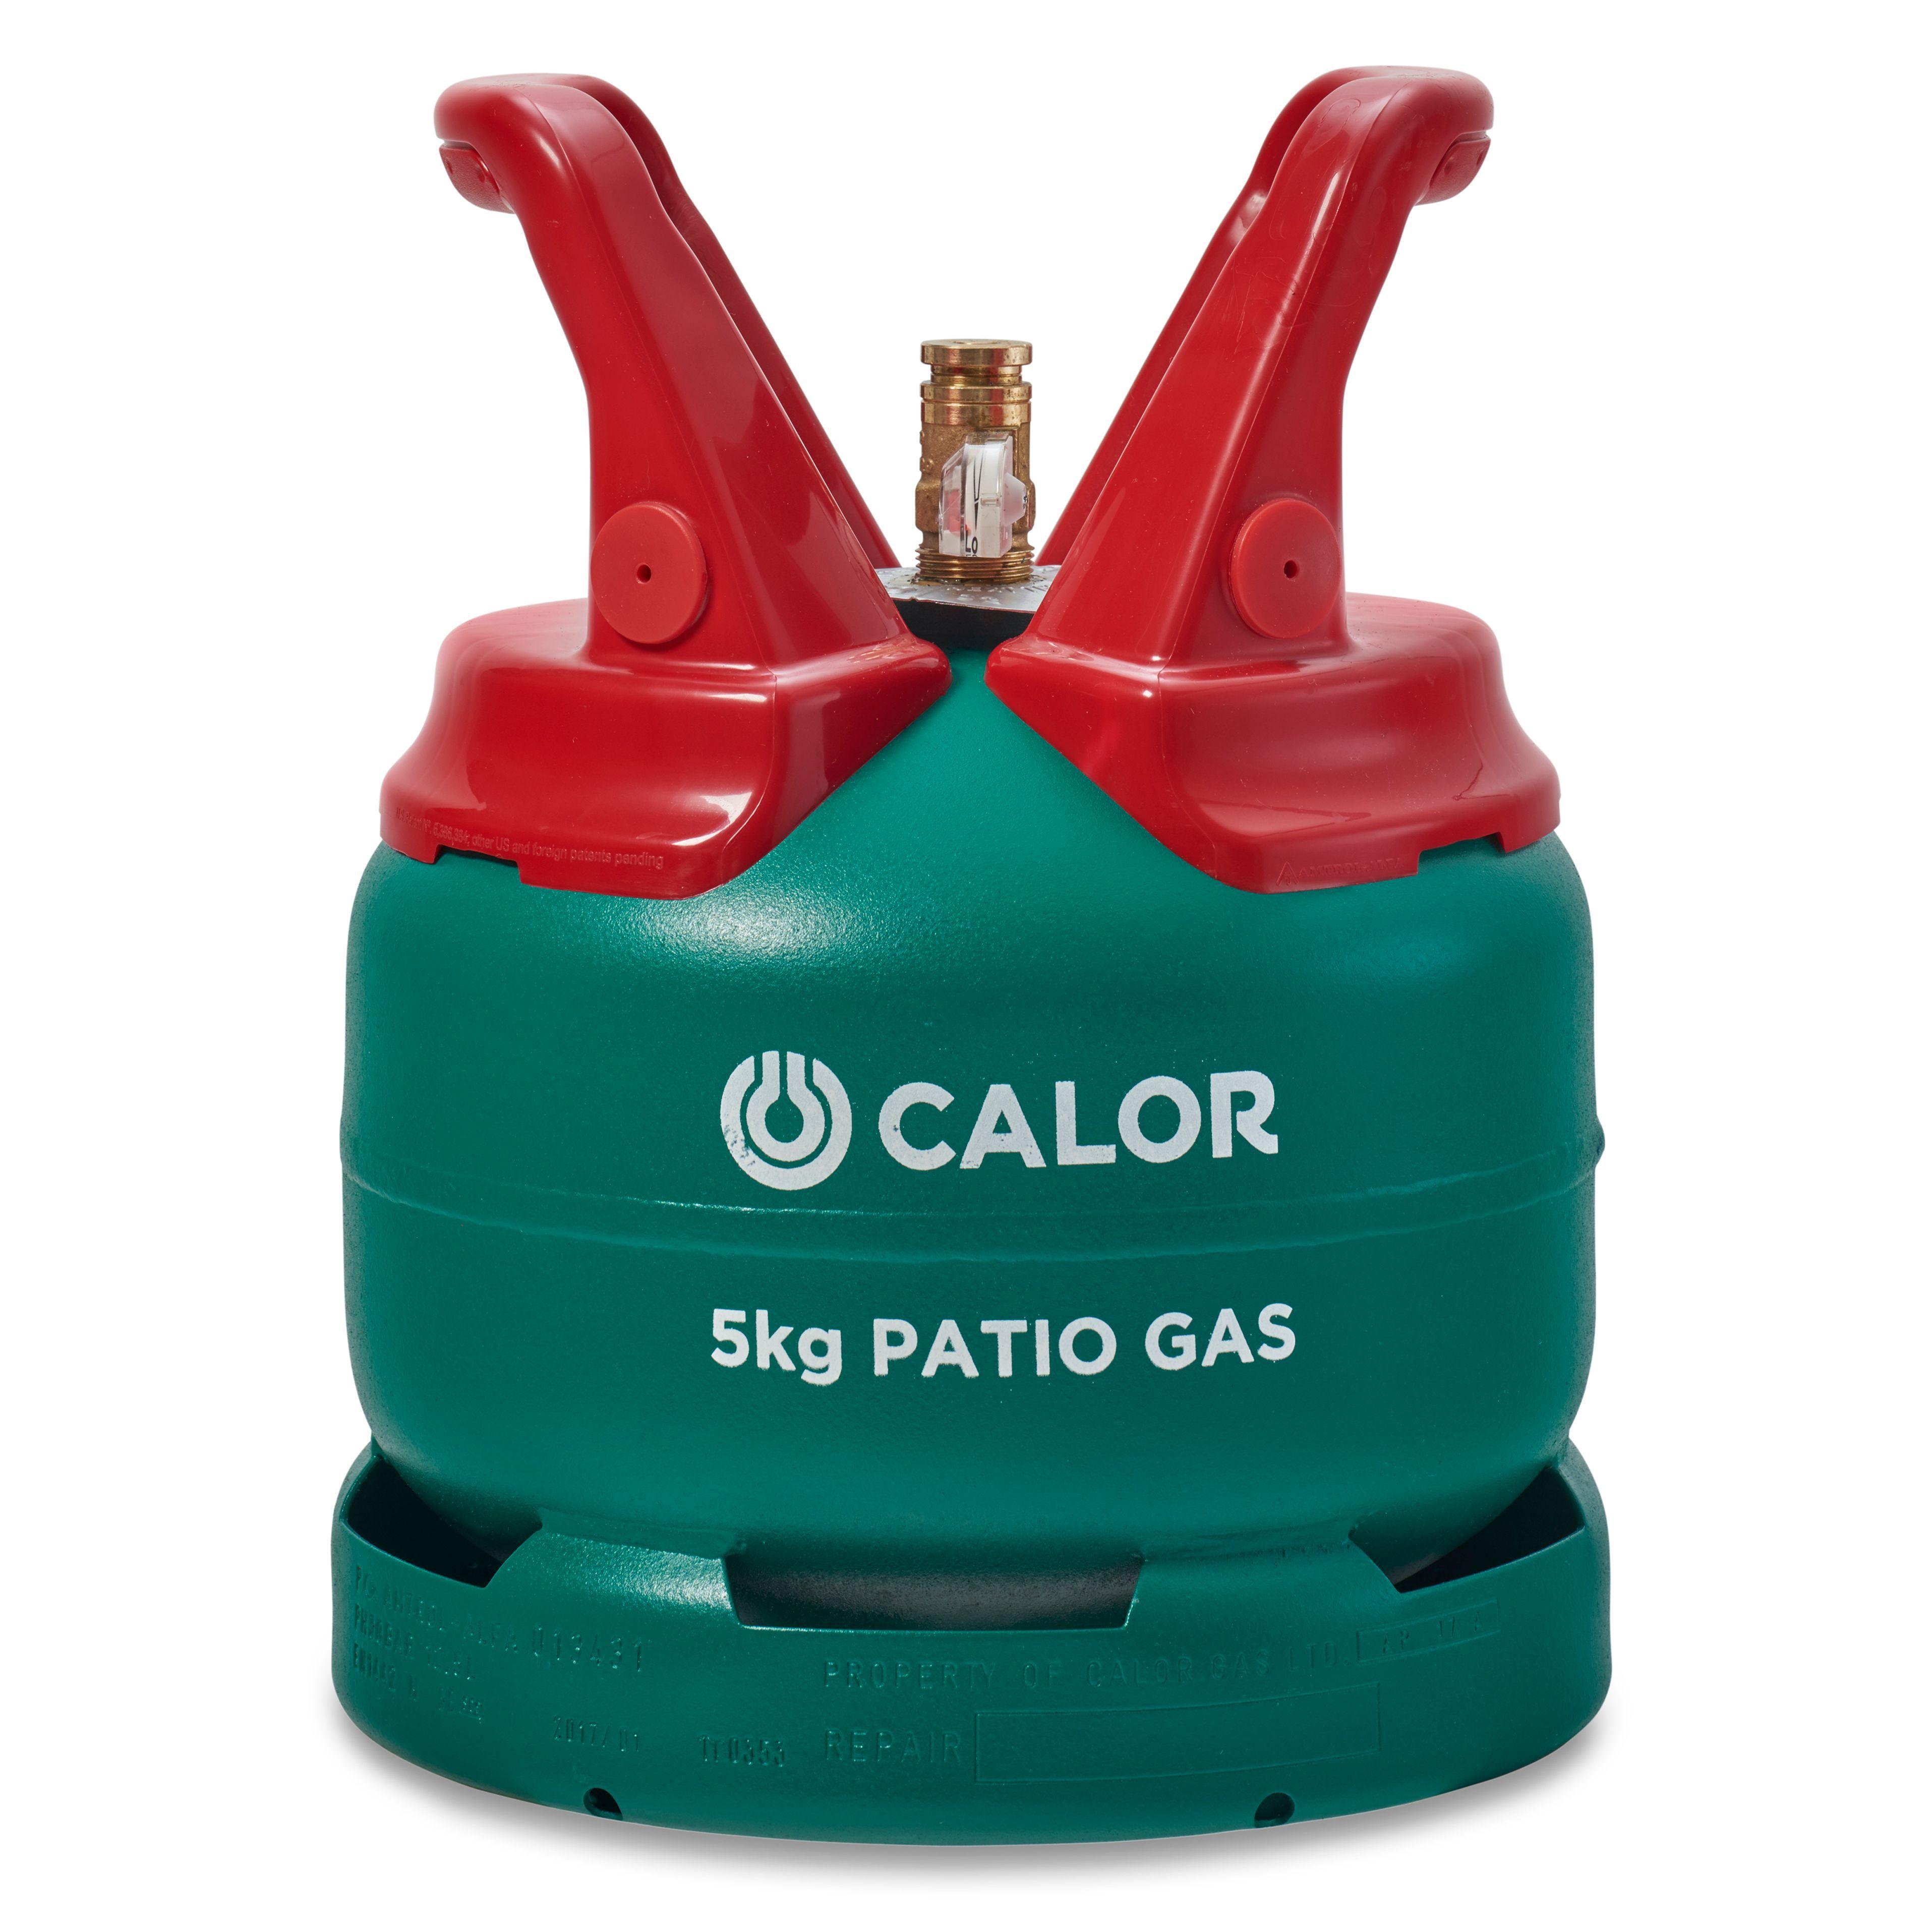 Paint Ideas For A Small Bathroom Calor Propane Gas Refill 5 Kg Departments Diy At B Amp Q